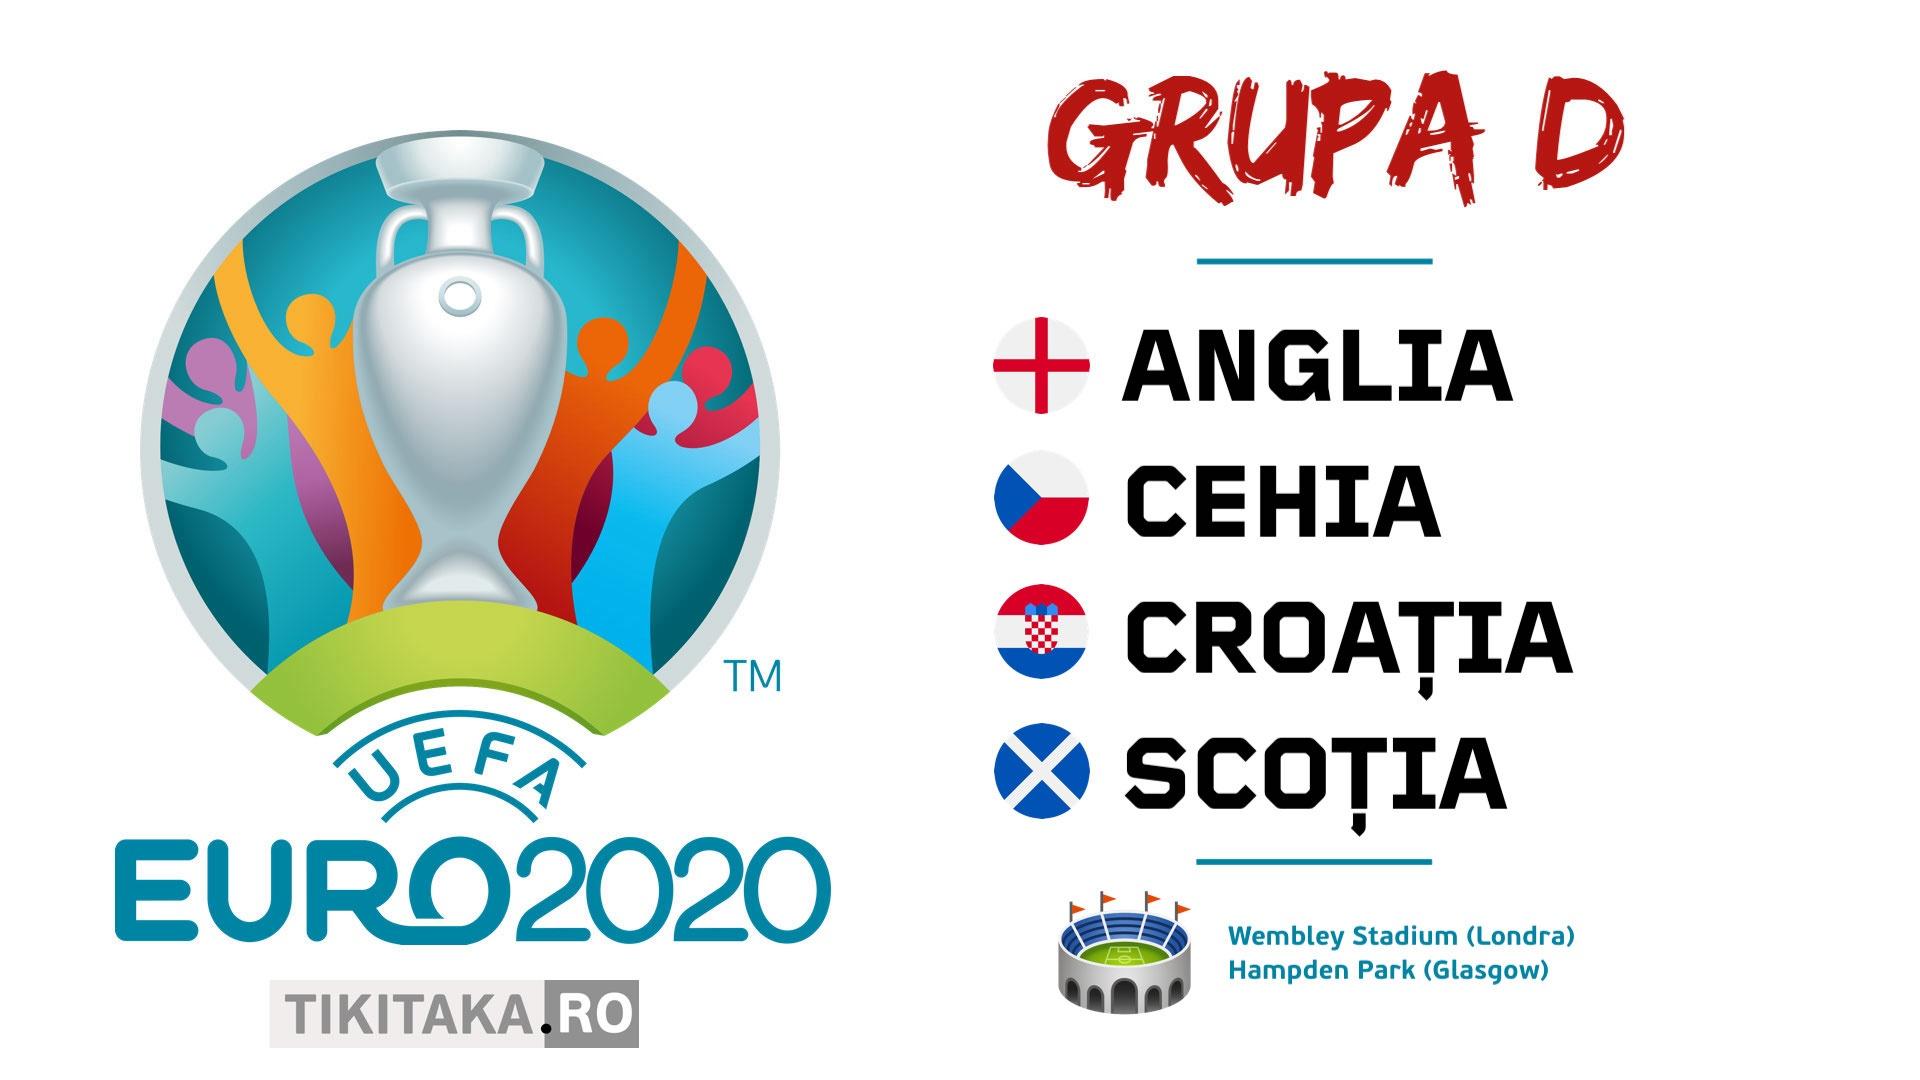 EURO2020 - GRUPA D